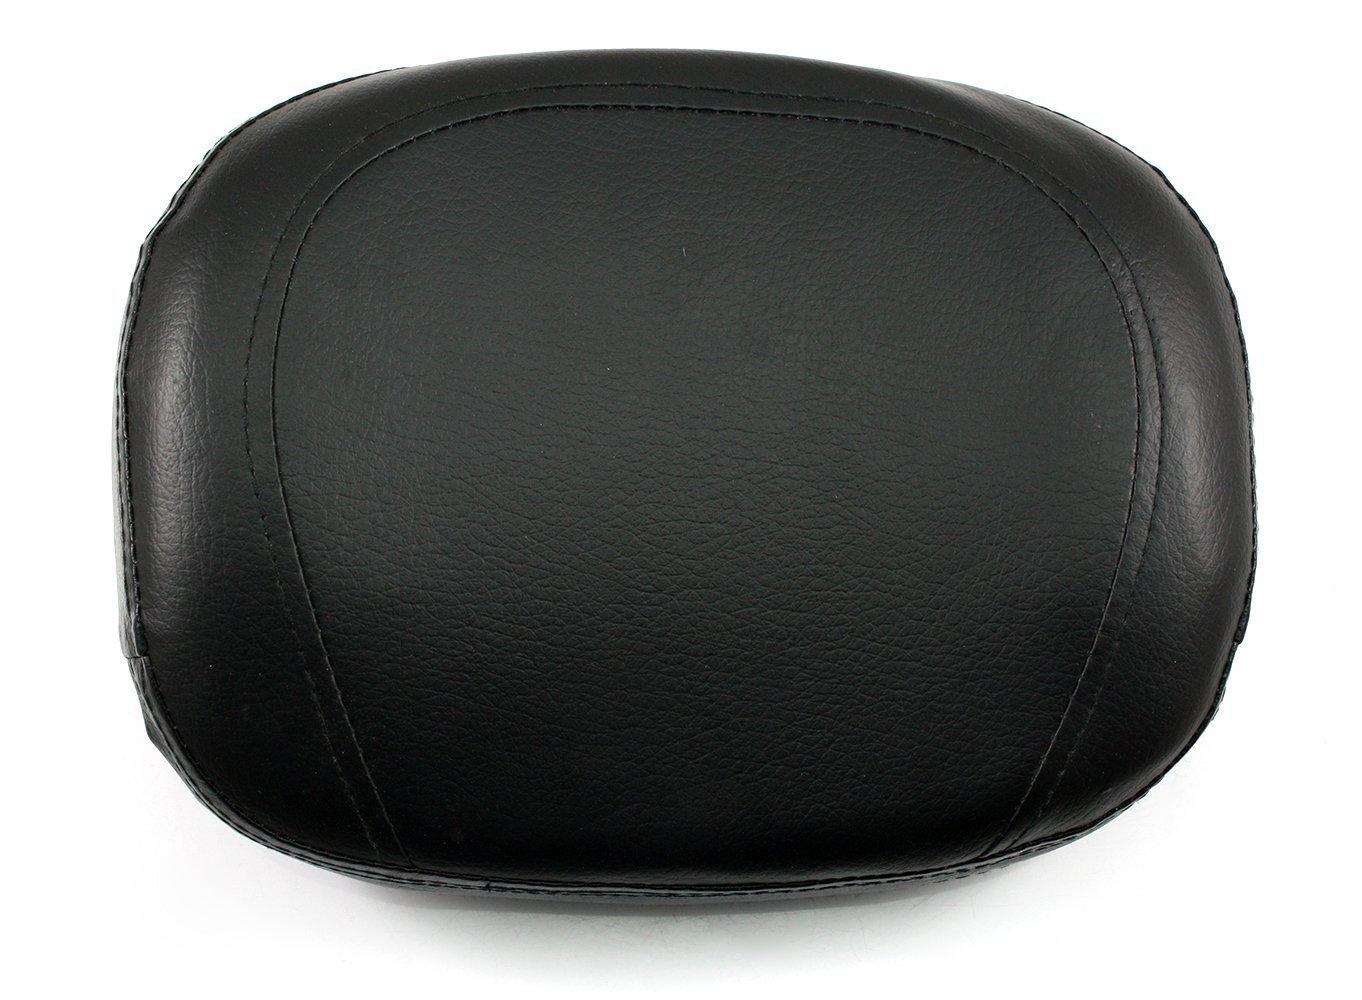 NEVERLAND Universal Black Backrest Cushion Pad for Harley Honda Kawasaki Suzuki Yamaha